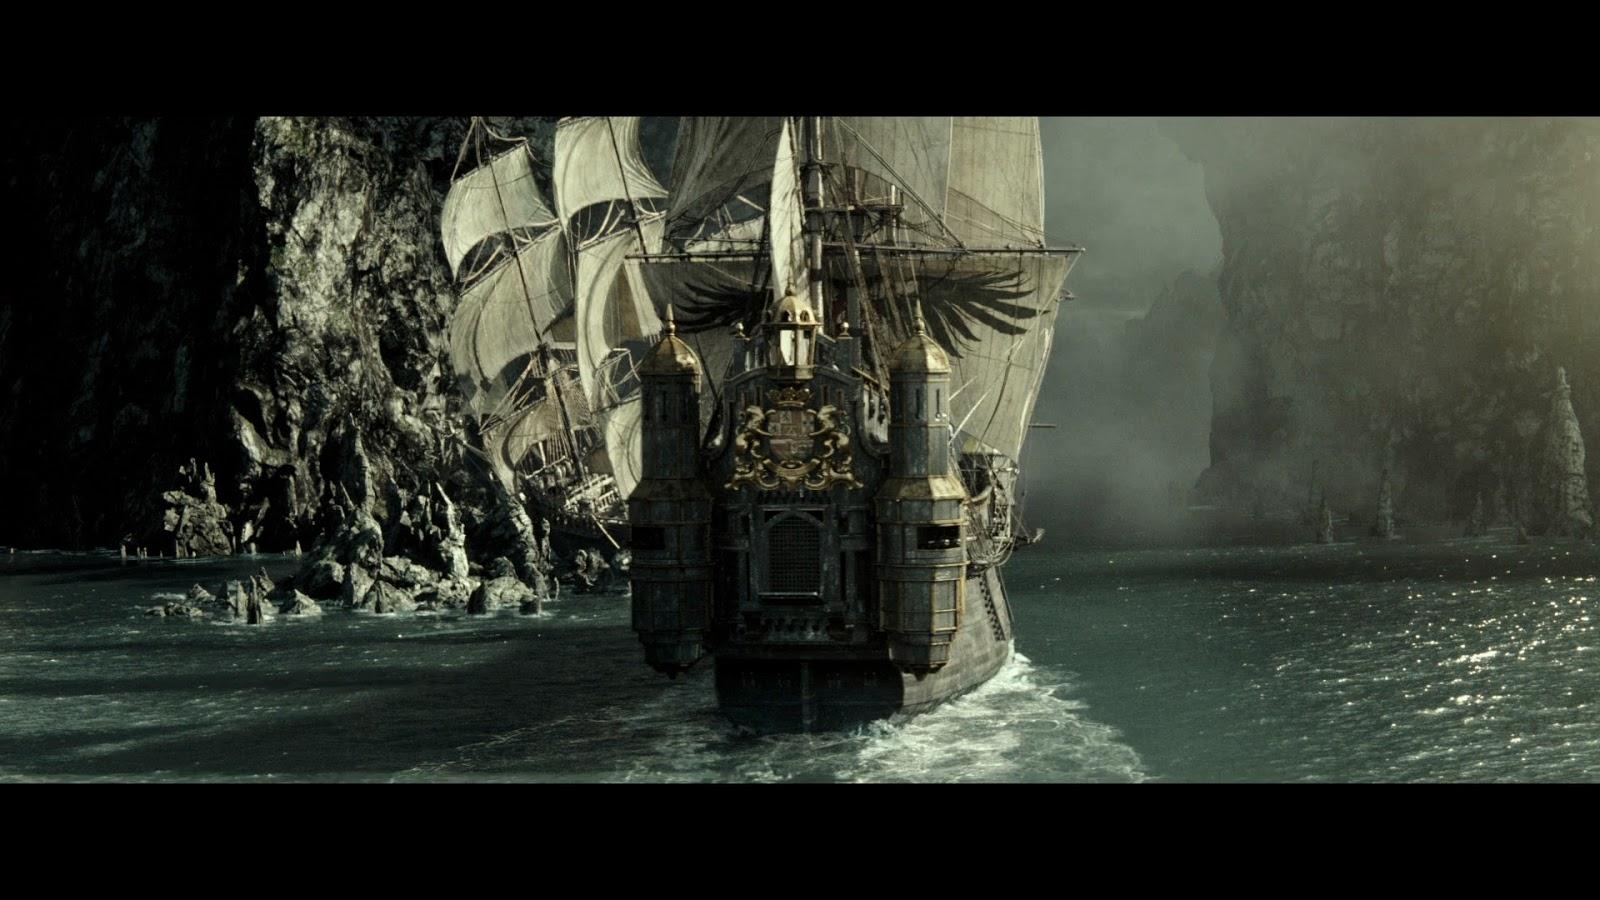 Piratas del Caribe 5: La venganza de Salazar (2017) Full HD 1080p Español Latino - Castellano - Ingles Captura 4